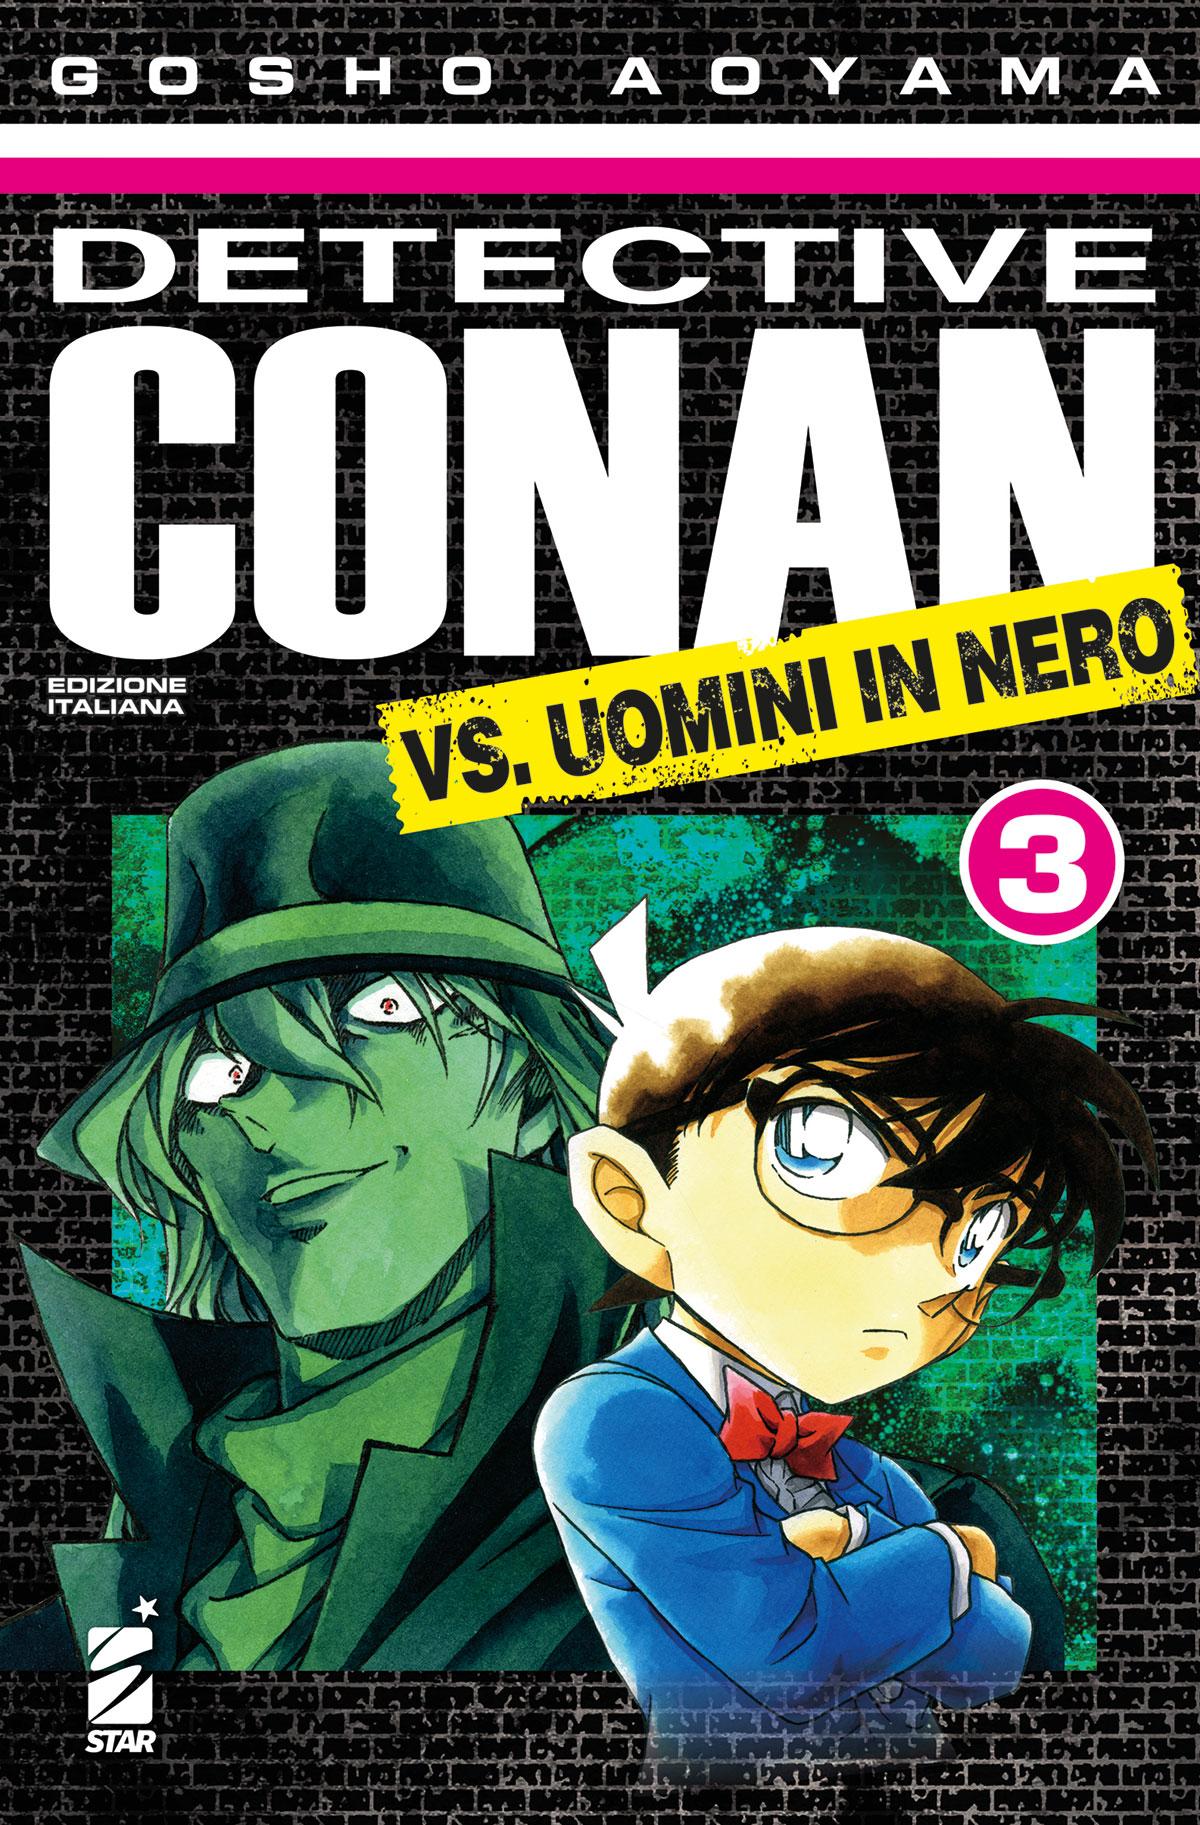 detectiveconan-vs-uominiinnero3-1200px